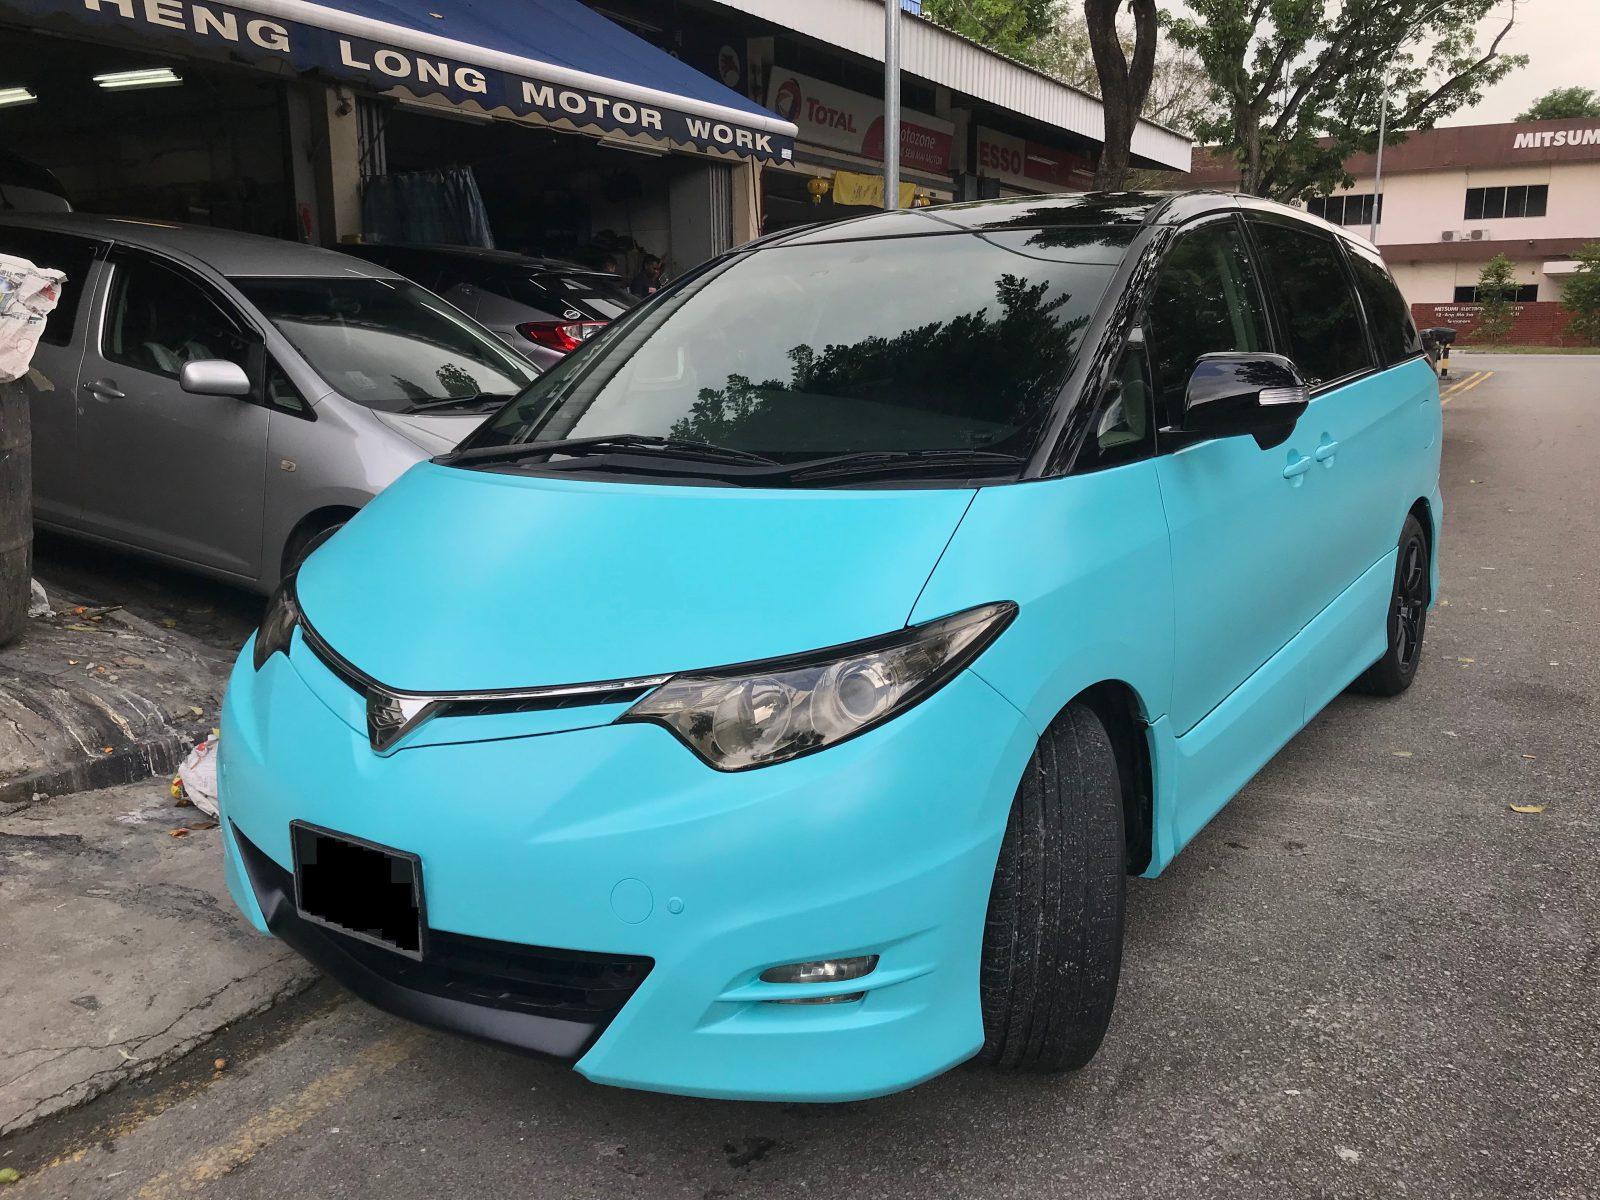 Toyota Estima Customized Spray Painting